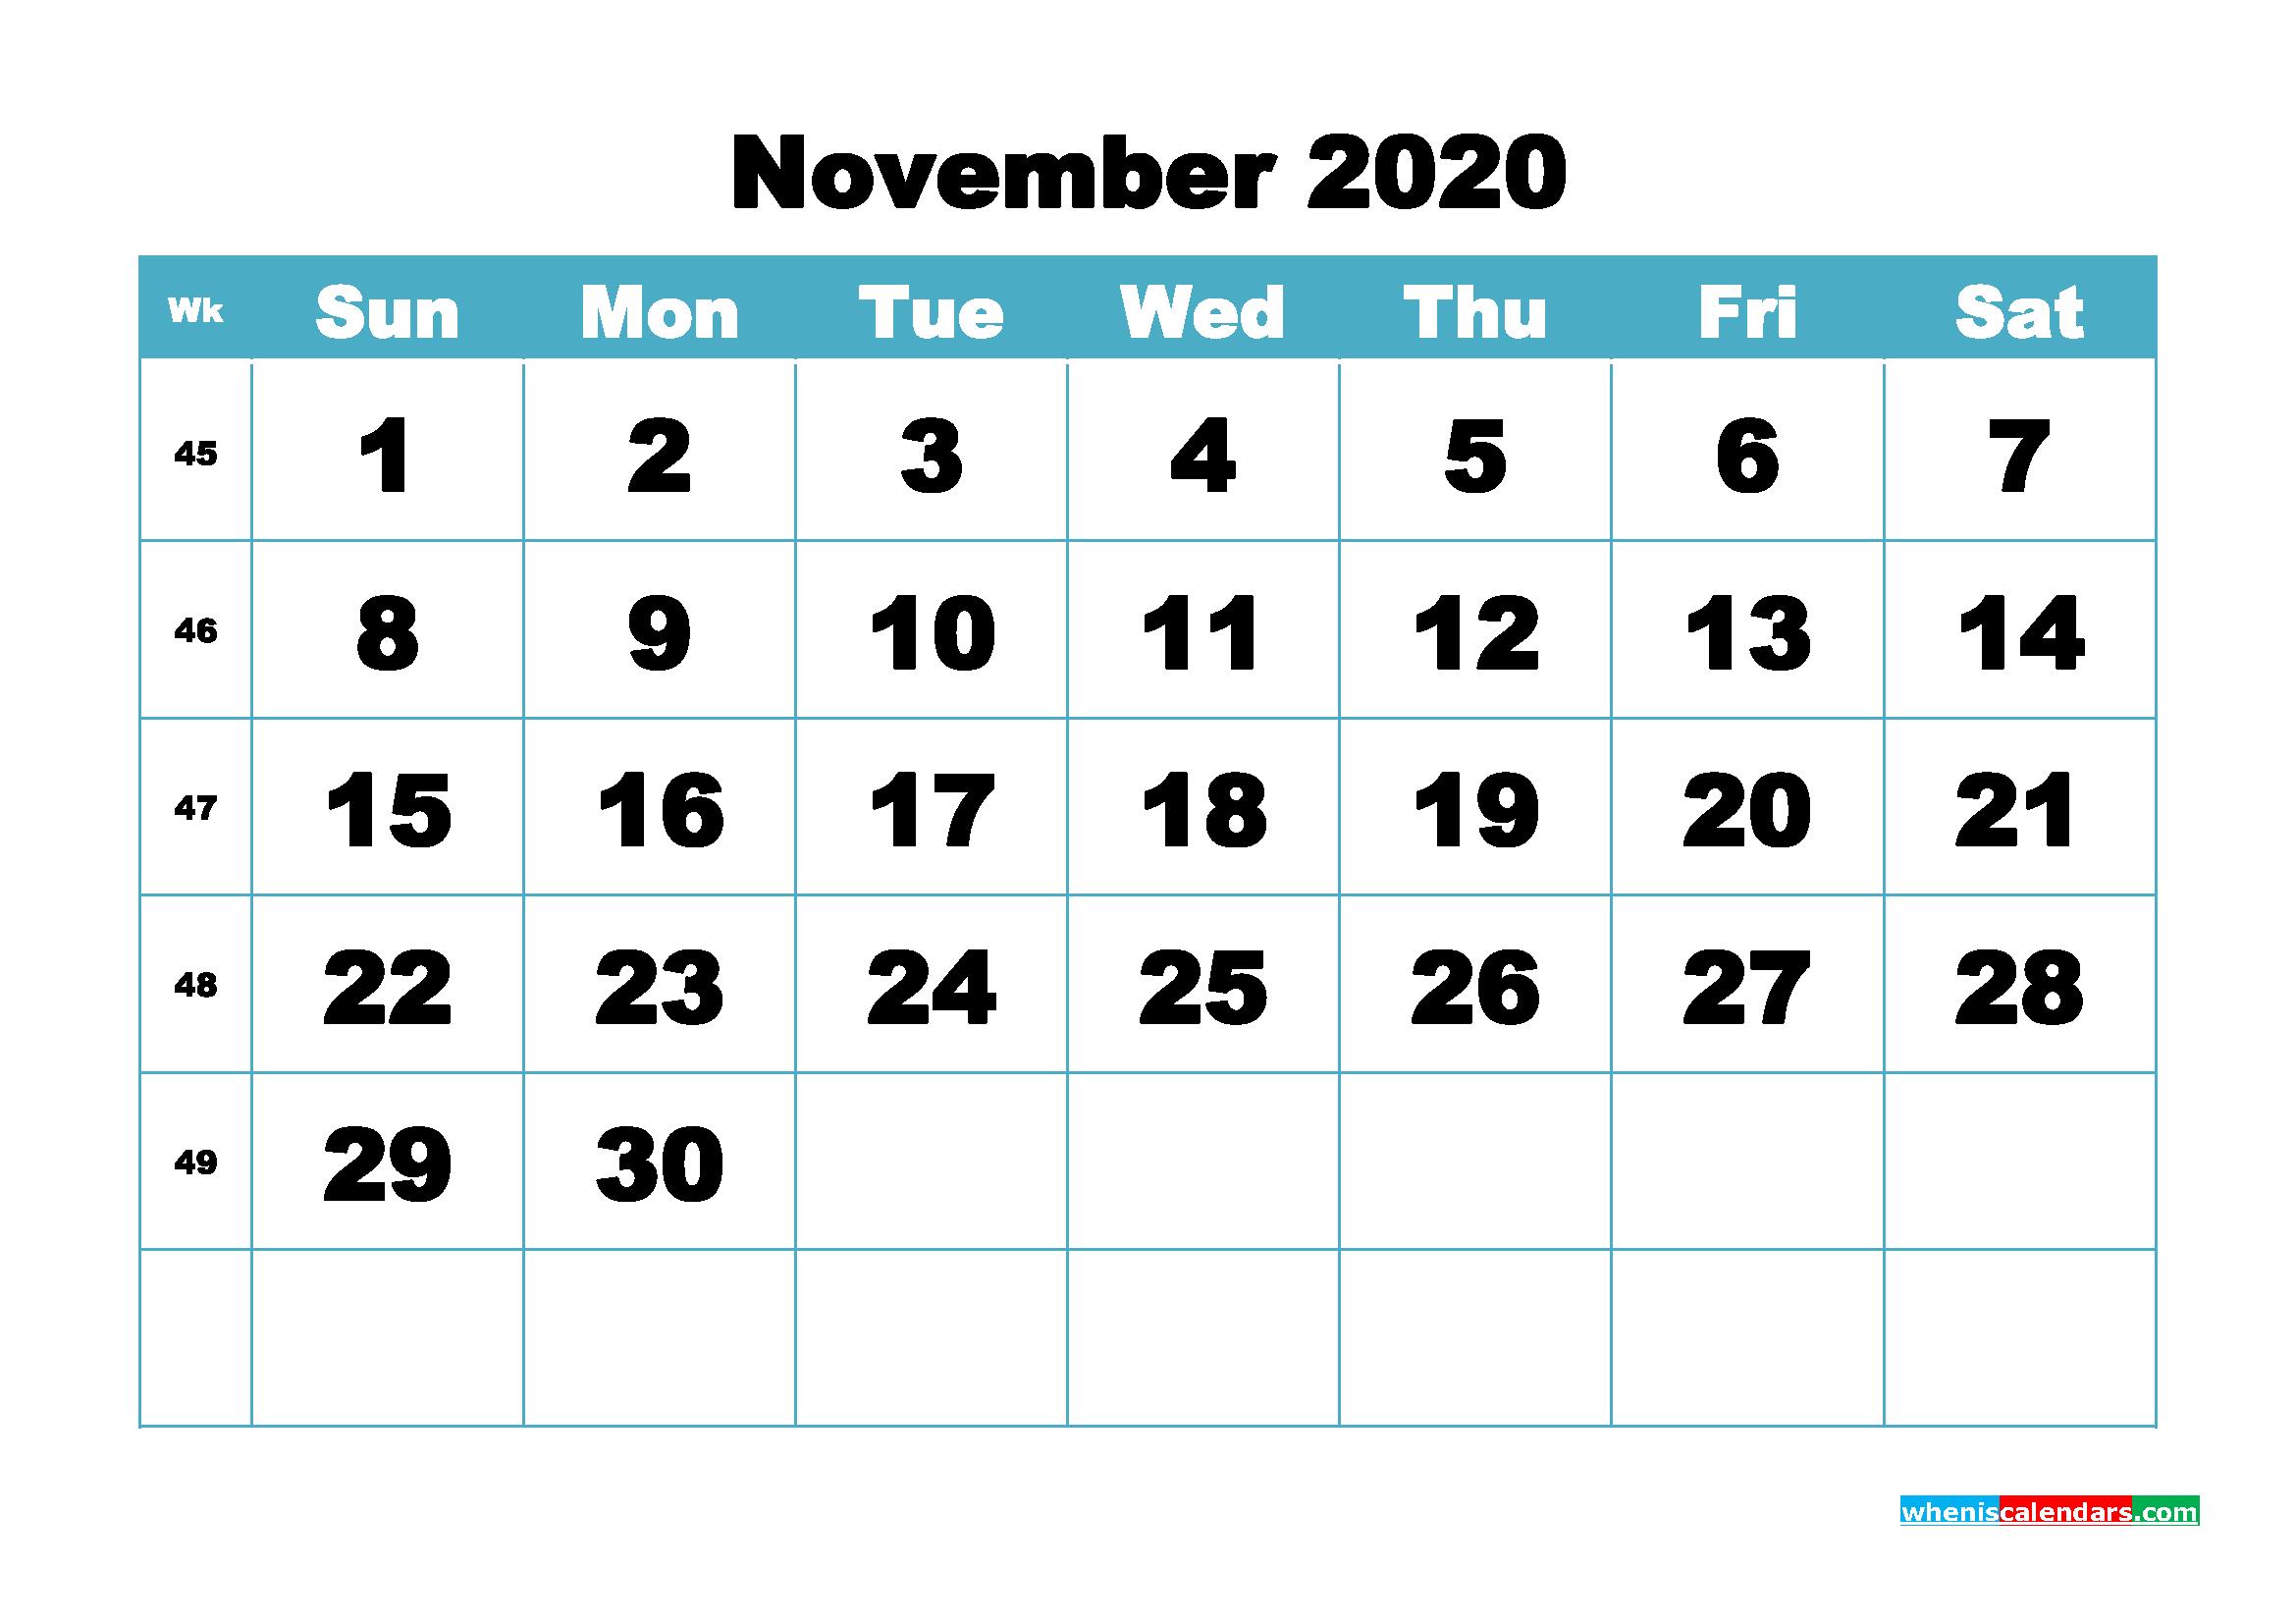 Blank November 2020 Calendar Printable - No.m20b419